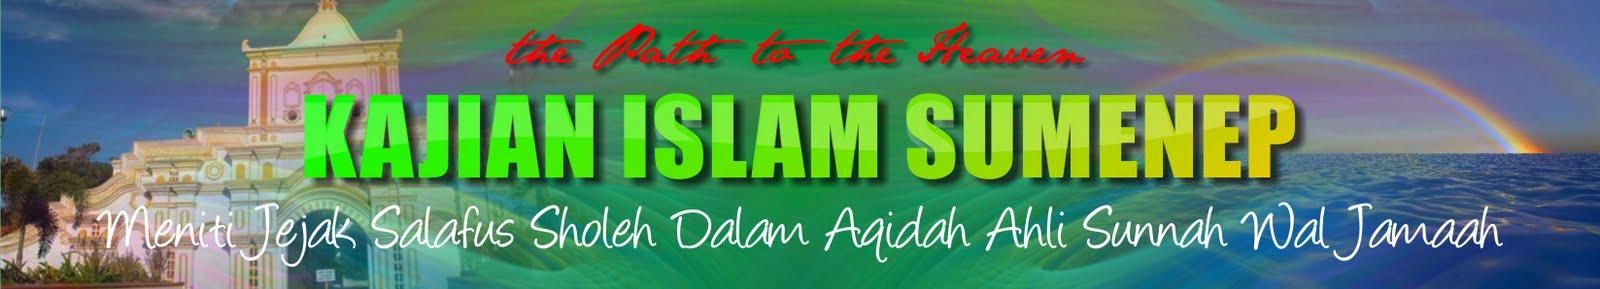 KAJIAN  ISLAM  SUMENEP